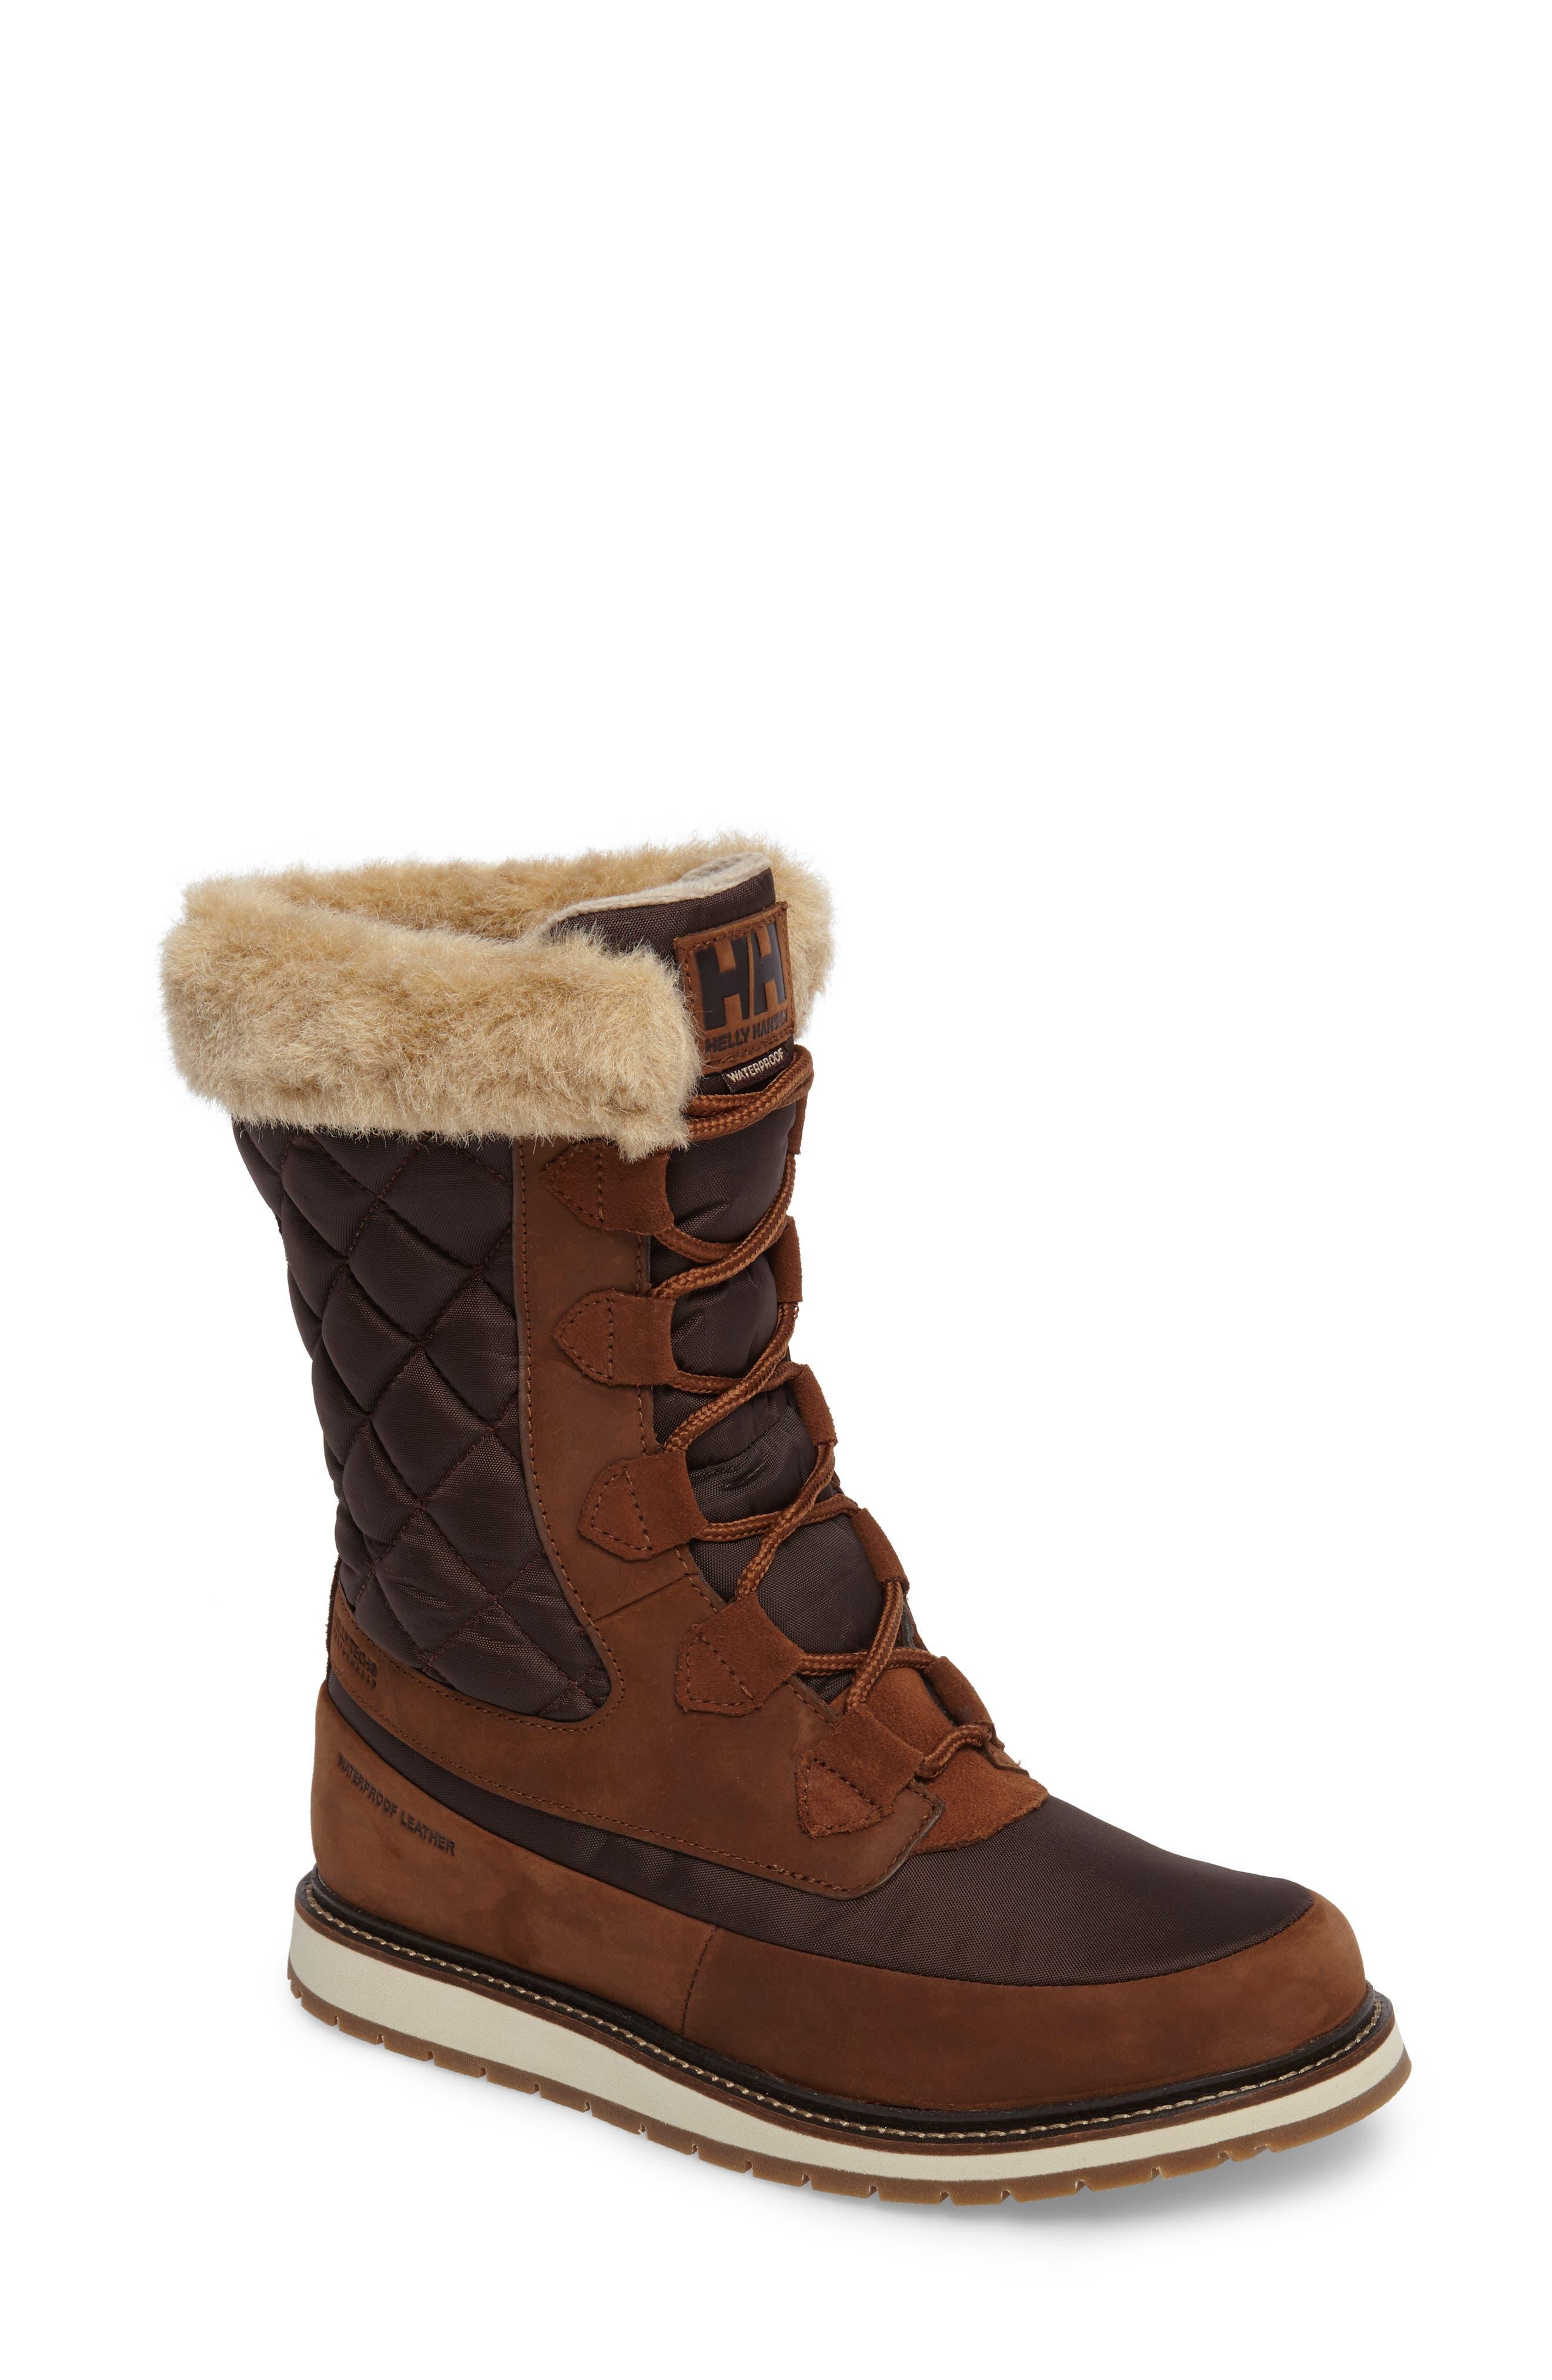 Alternate Image 1 Selected - Helly Hansen Arosa Waterproof Boot with Faux Fur Trim (Women)